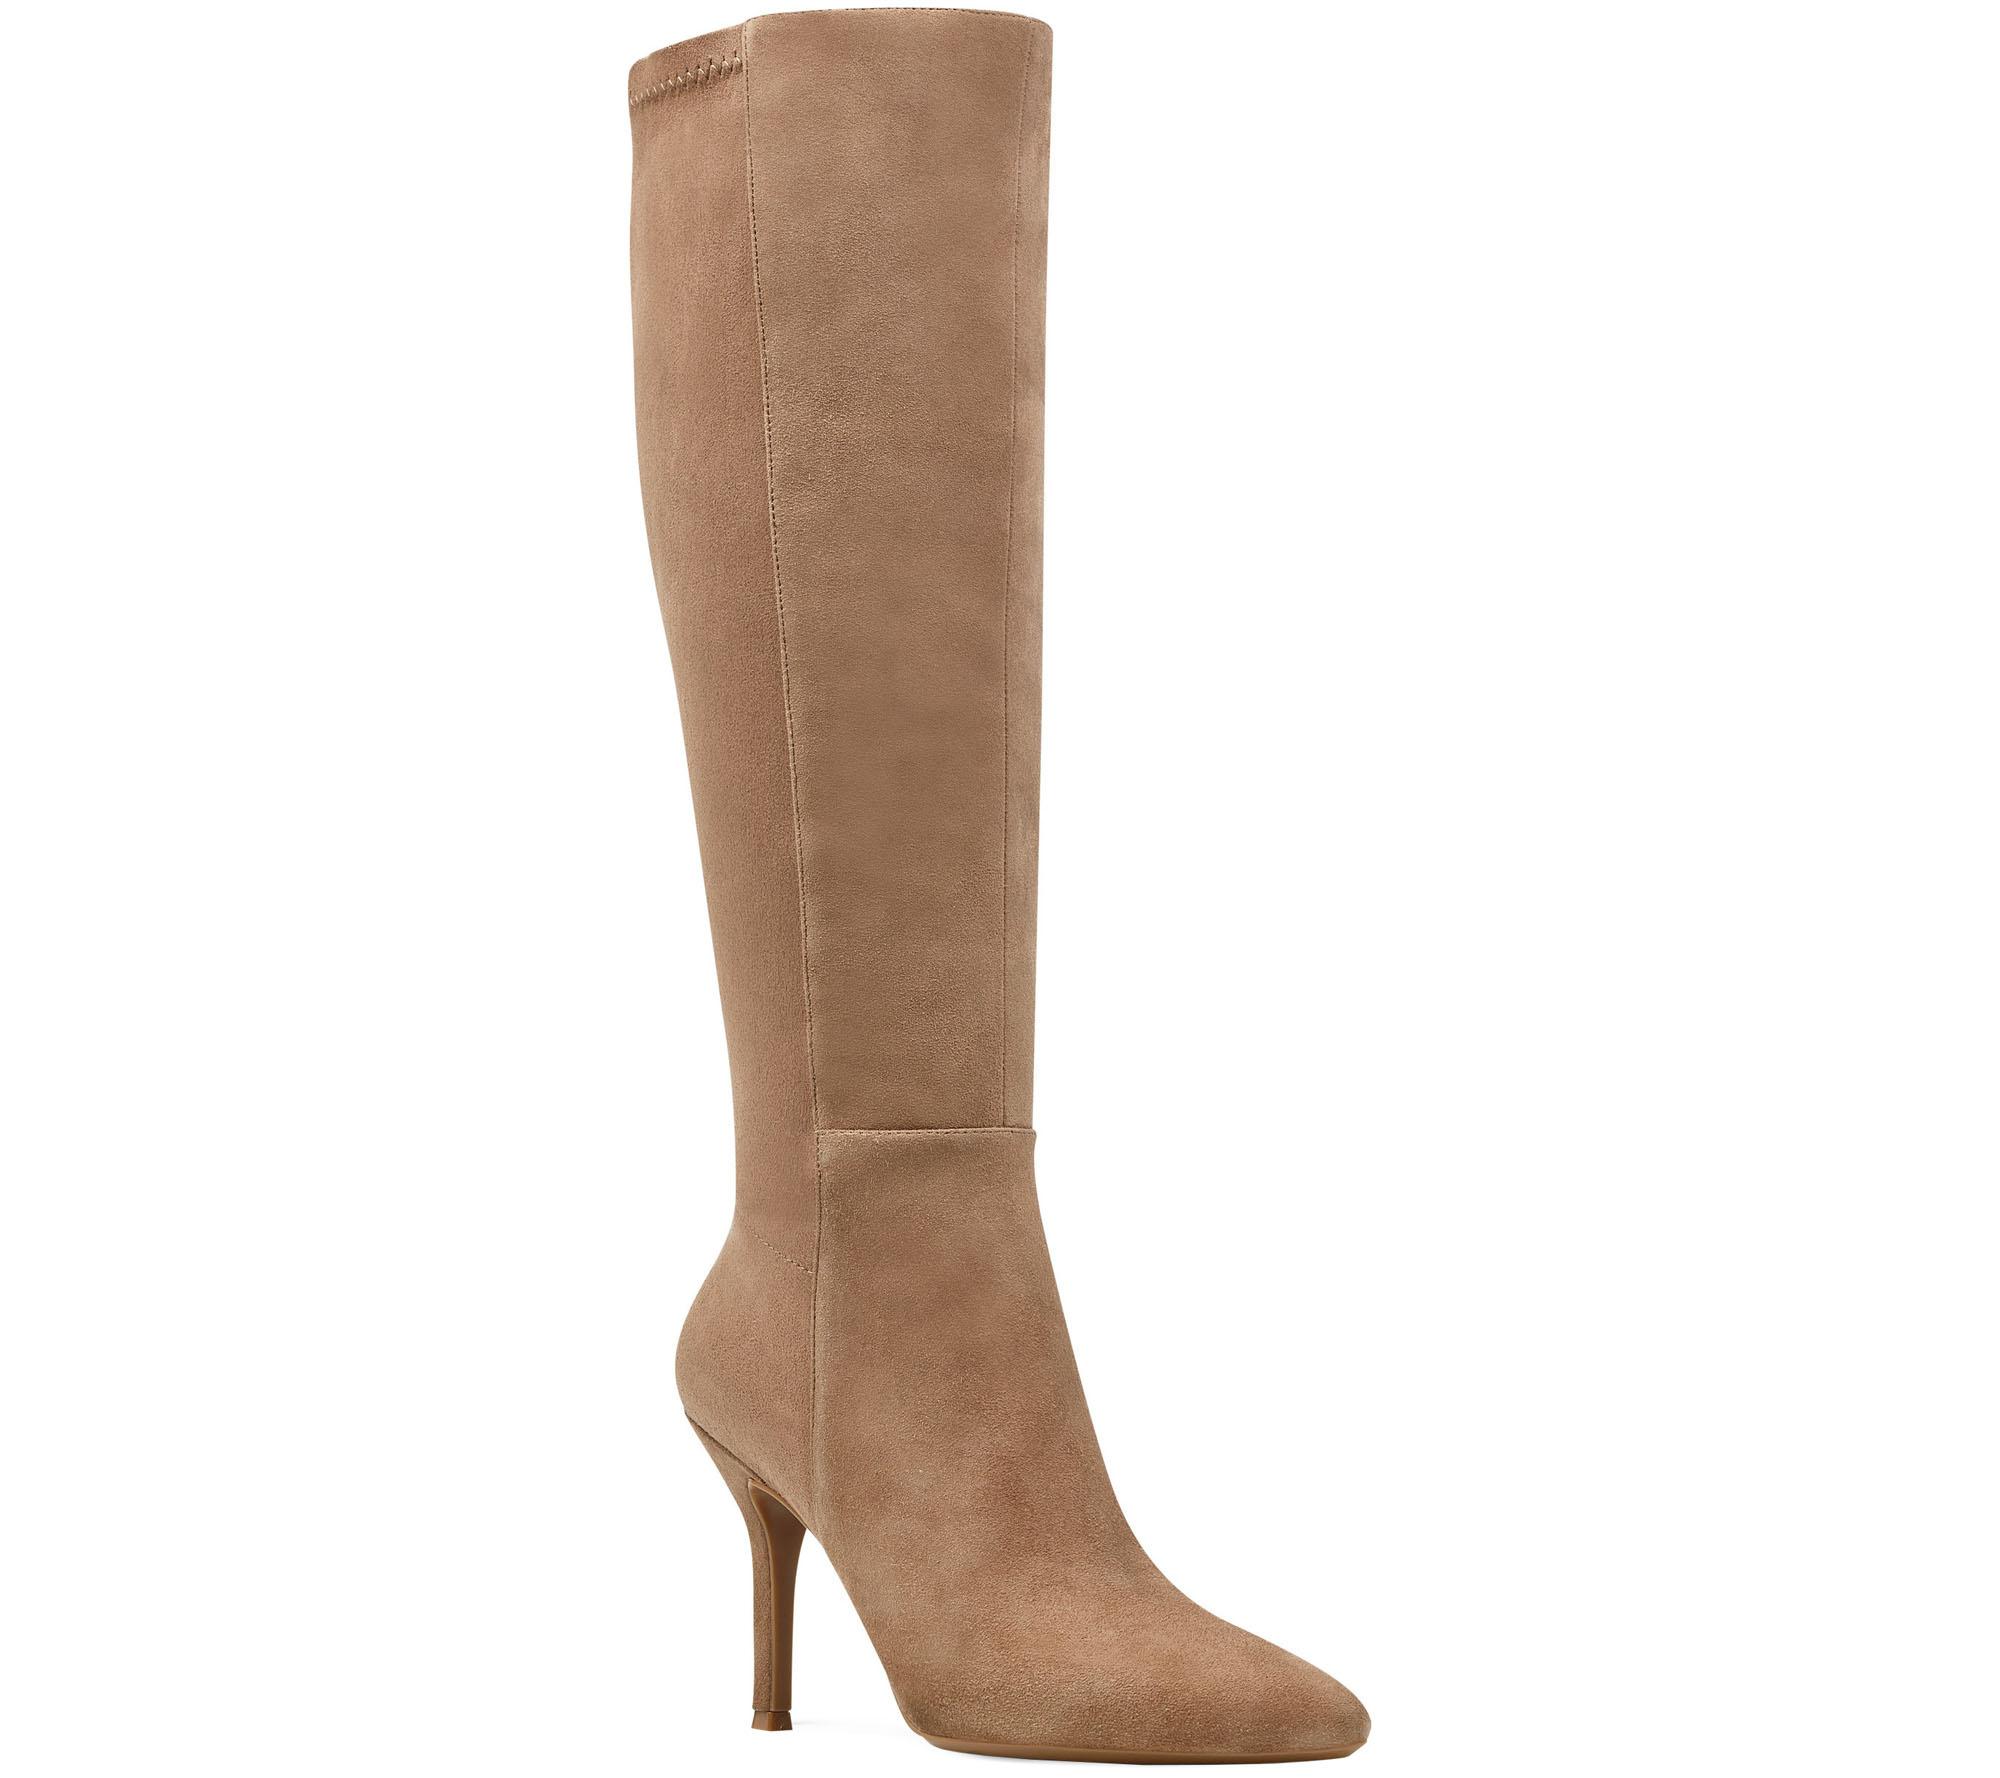 Nine West Fallon Tall Boot(Women's) -Black/Black Suede